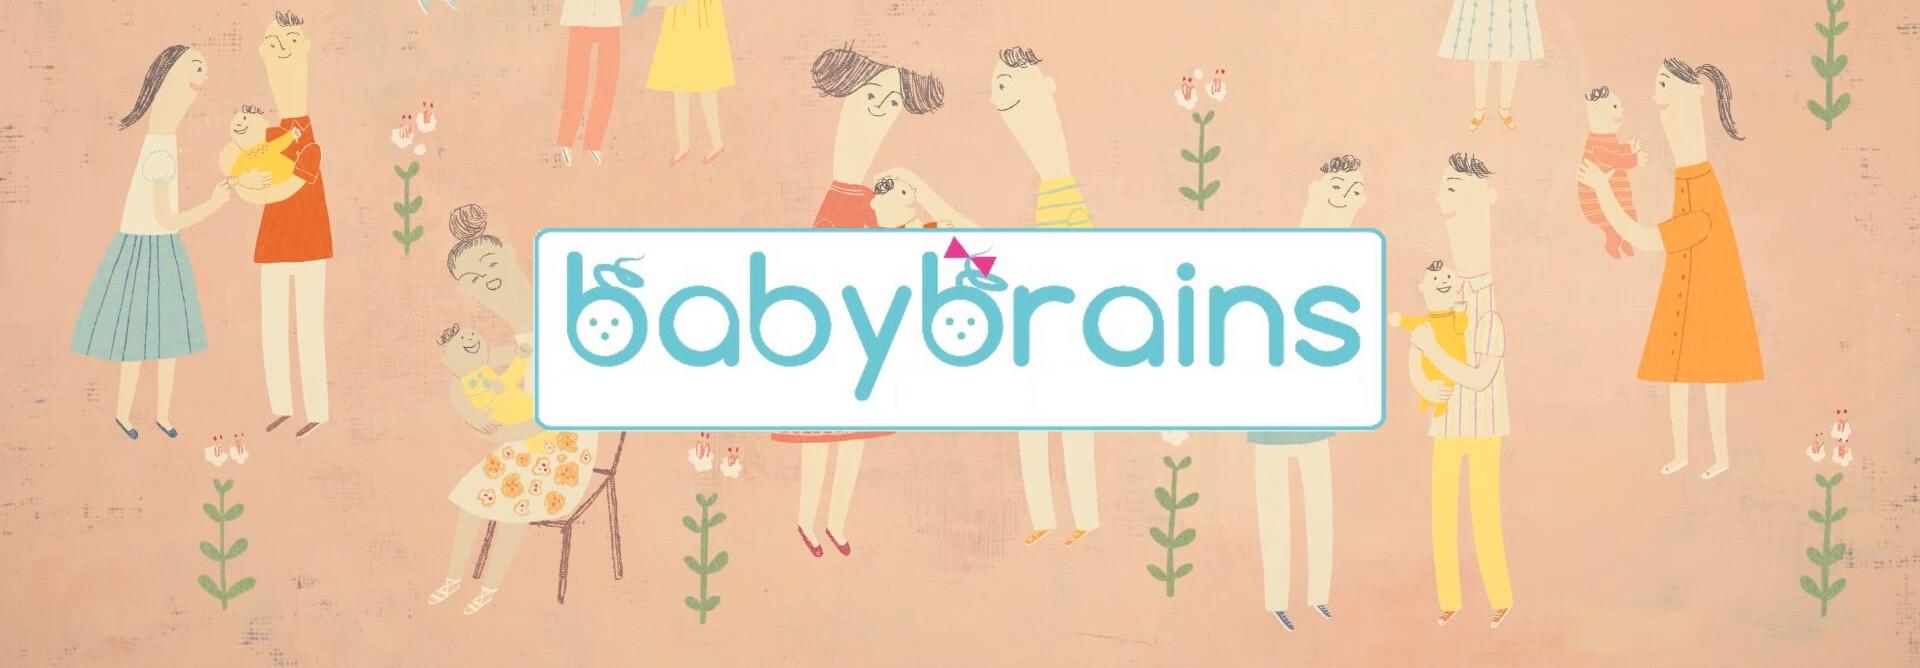 BabyBrains